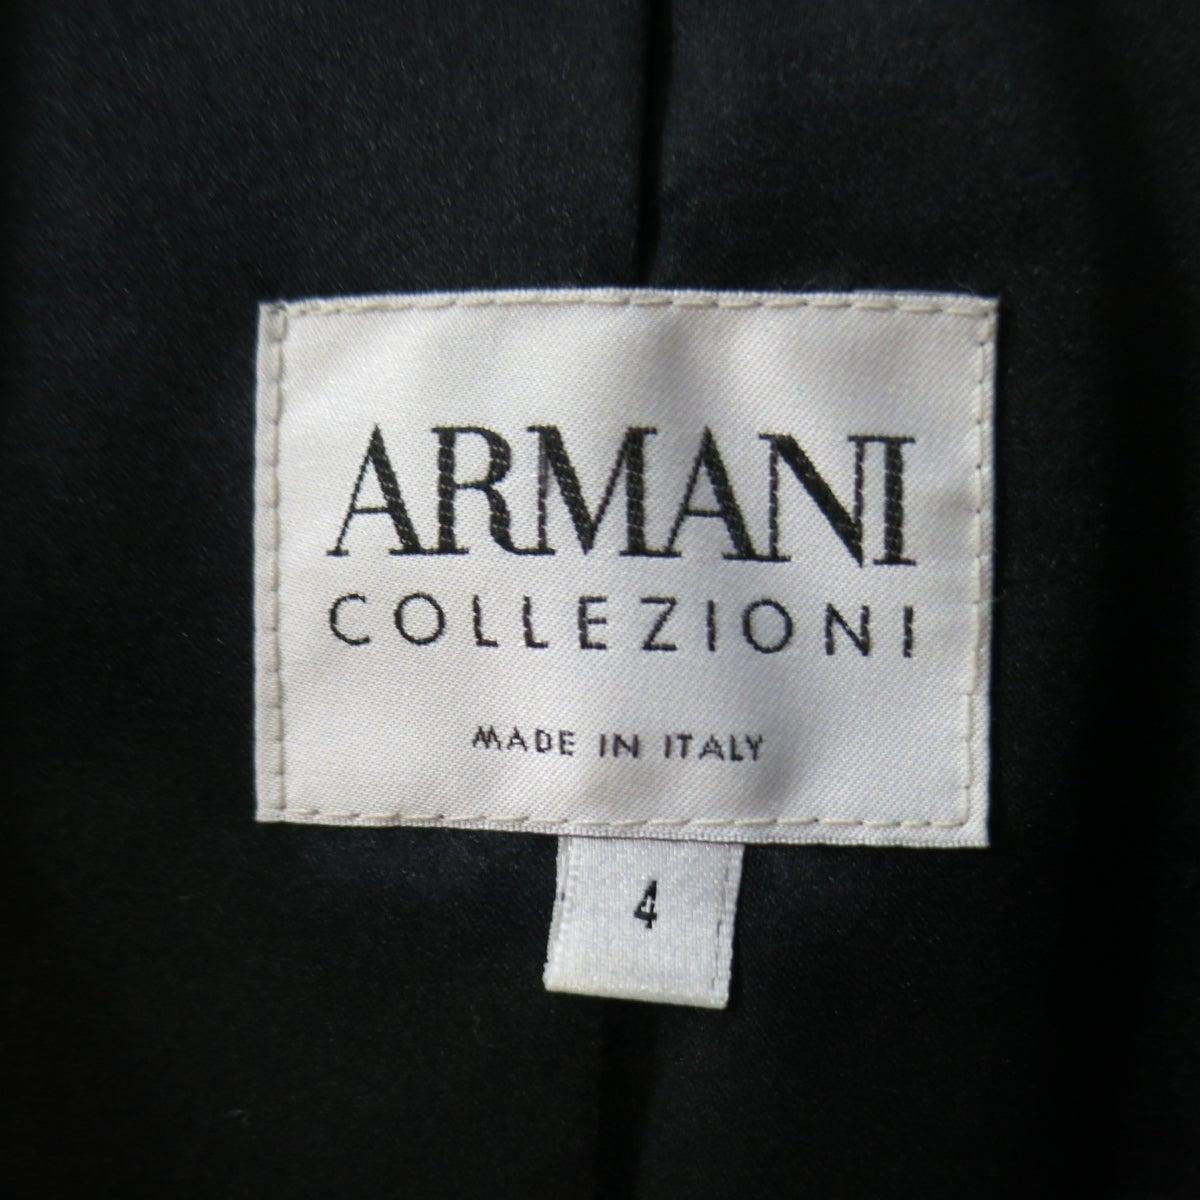 2444a168360 ARMANI COLLEZIONI Jacket Size 4 Black Velvet Under Ruffle Shawl Collar  Tuxedo For Sale at 1stdibs